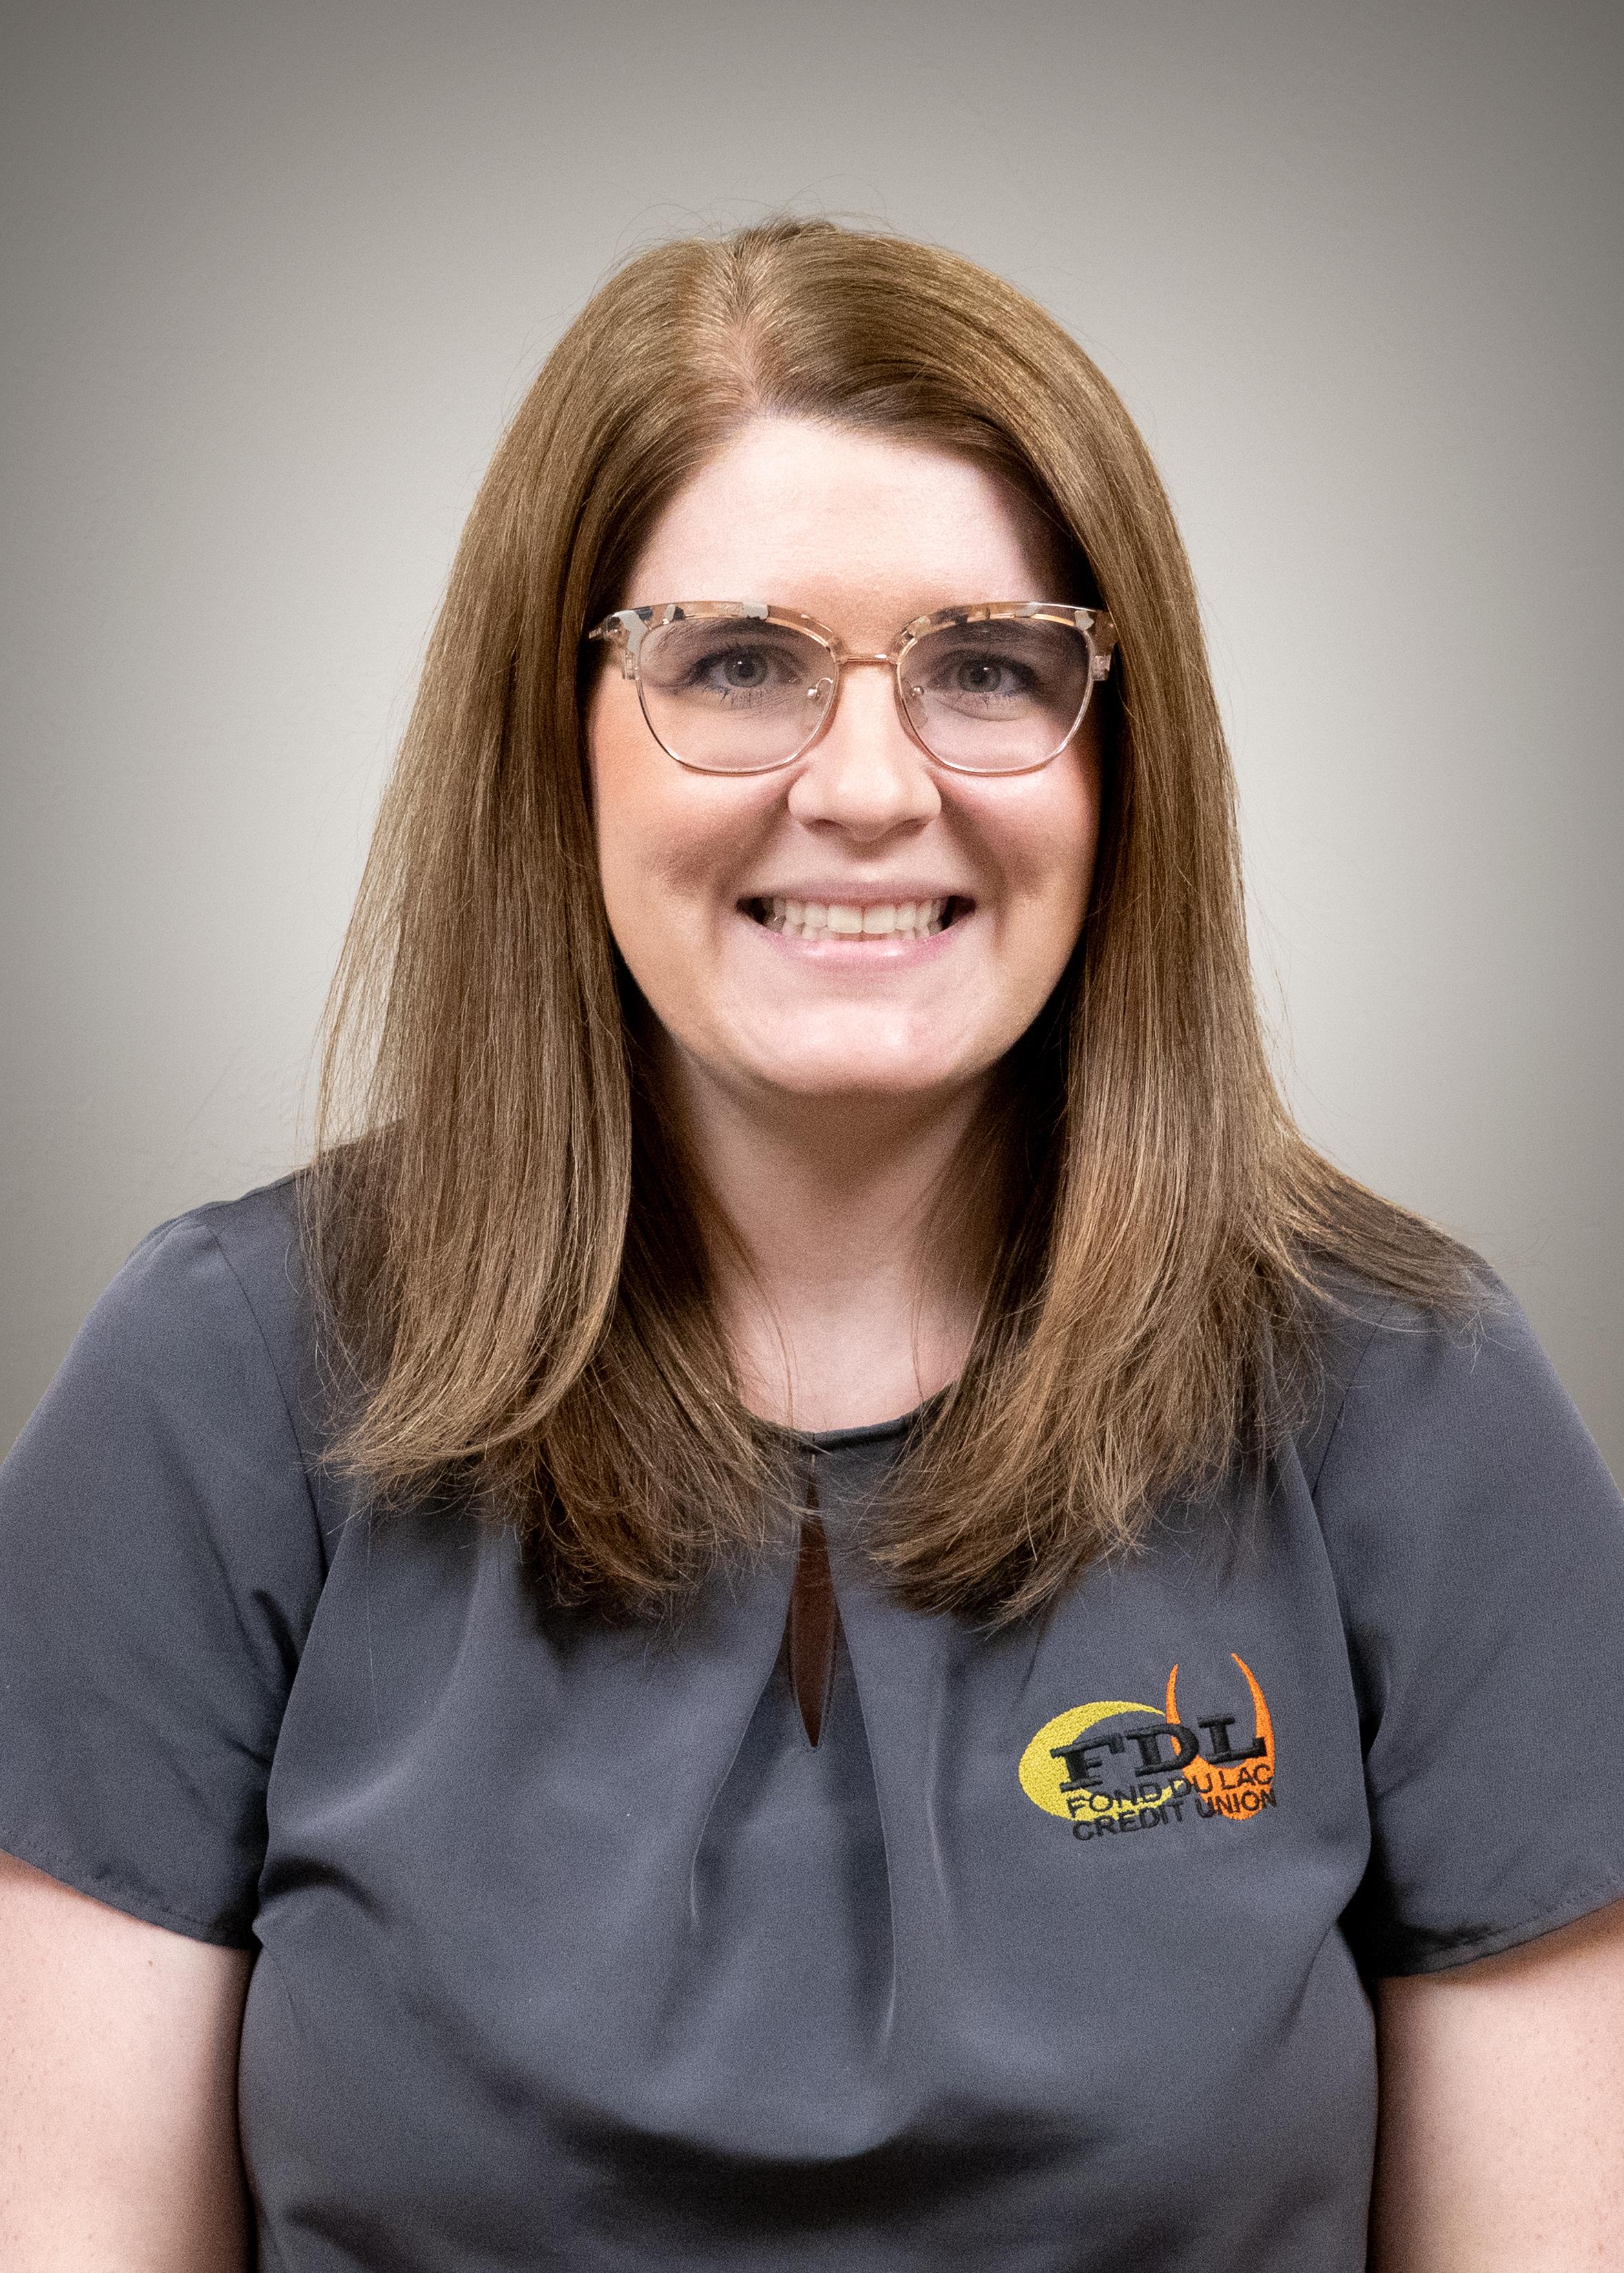 Megan Gysbers